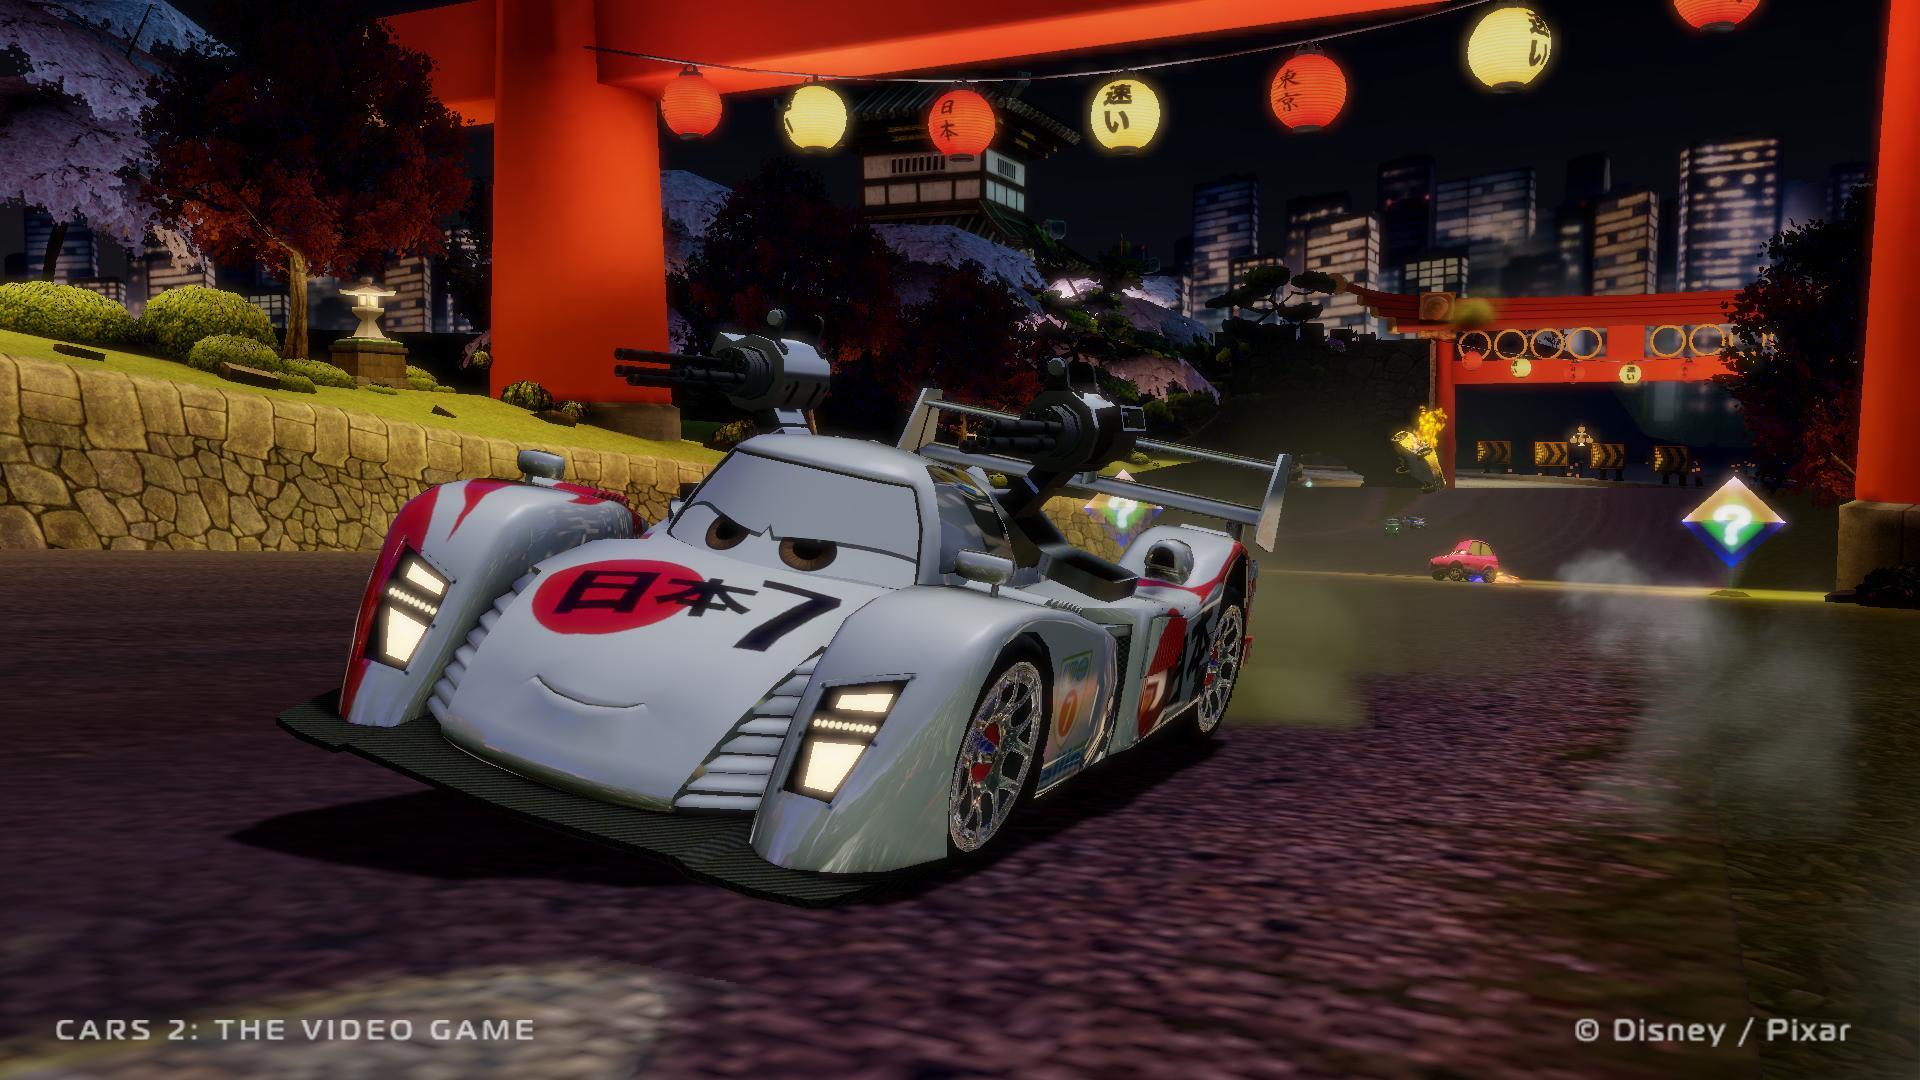 Image - Cars-2-video-game-screen-1.jpg | Pixar Wiki | FANDOM powered ...